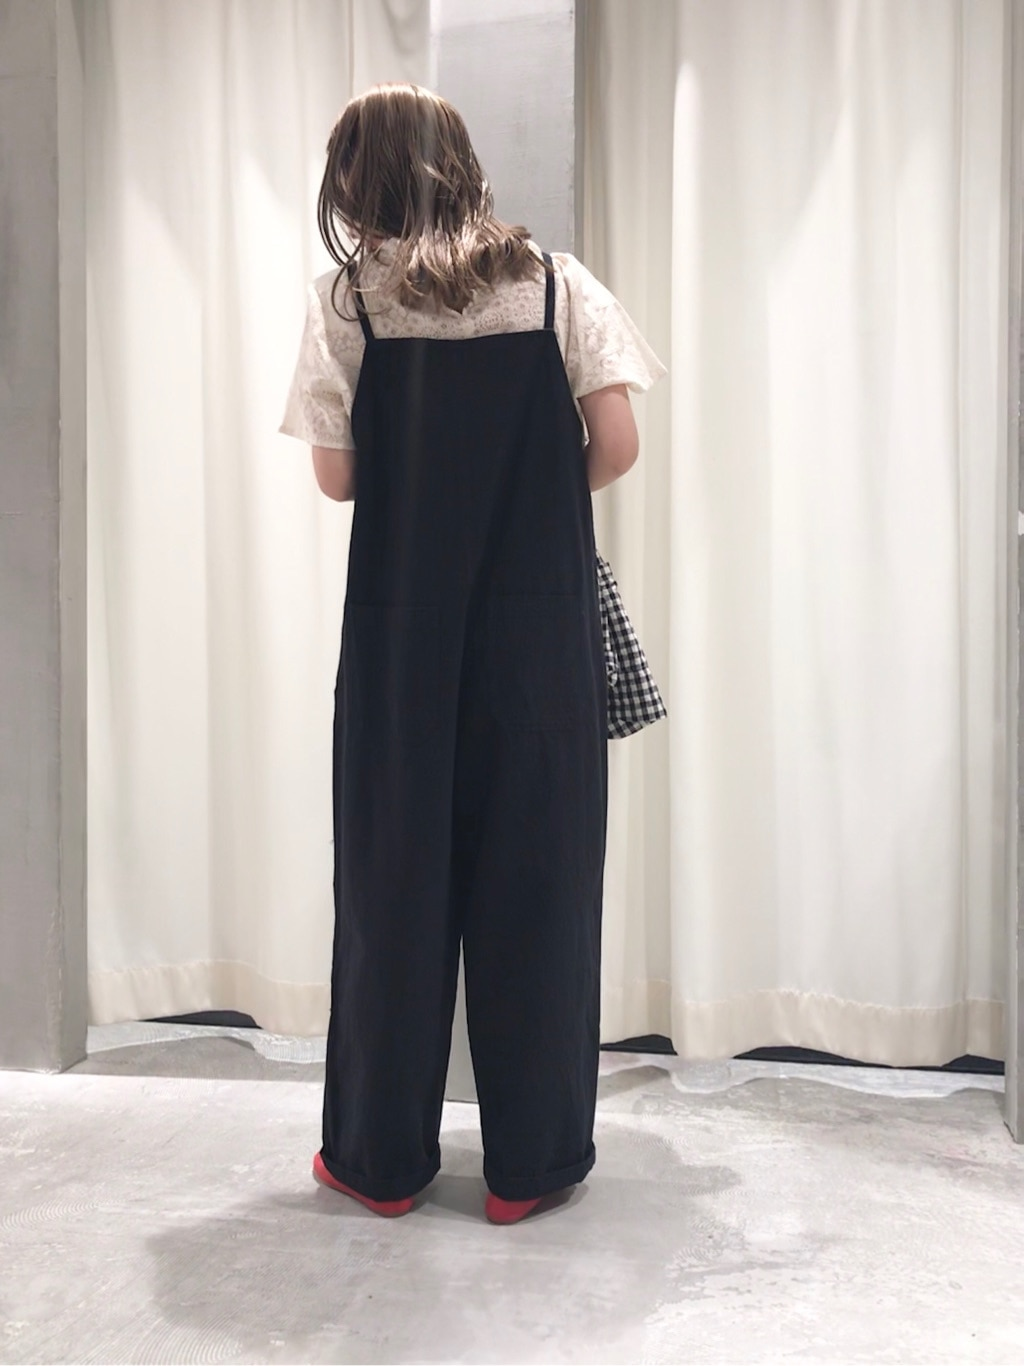 AMB SHOP CHILD WOMAN CHILD WOMAN , PAR ICI ルミネ横浜 身長:155cm 2020.03.25